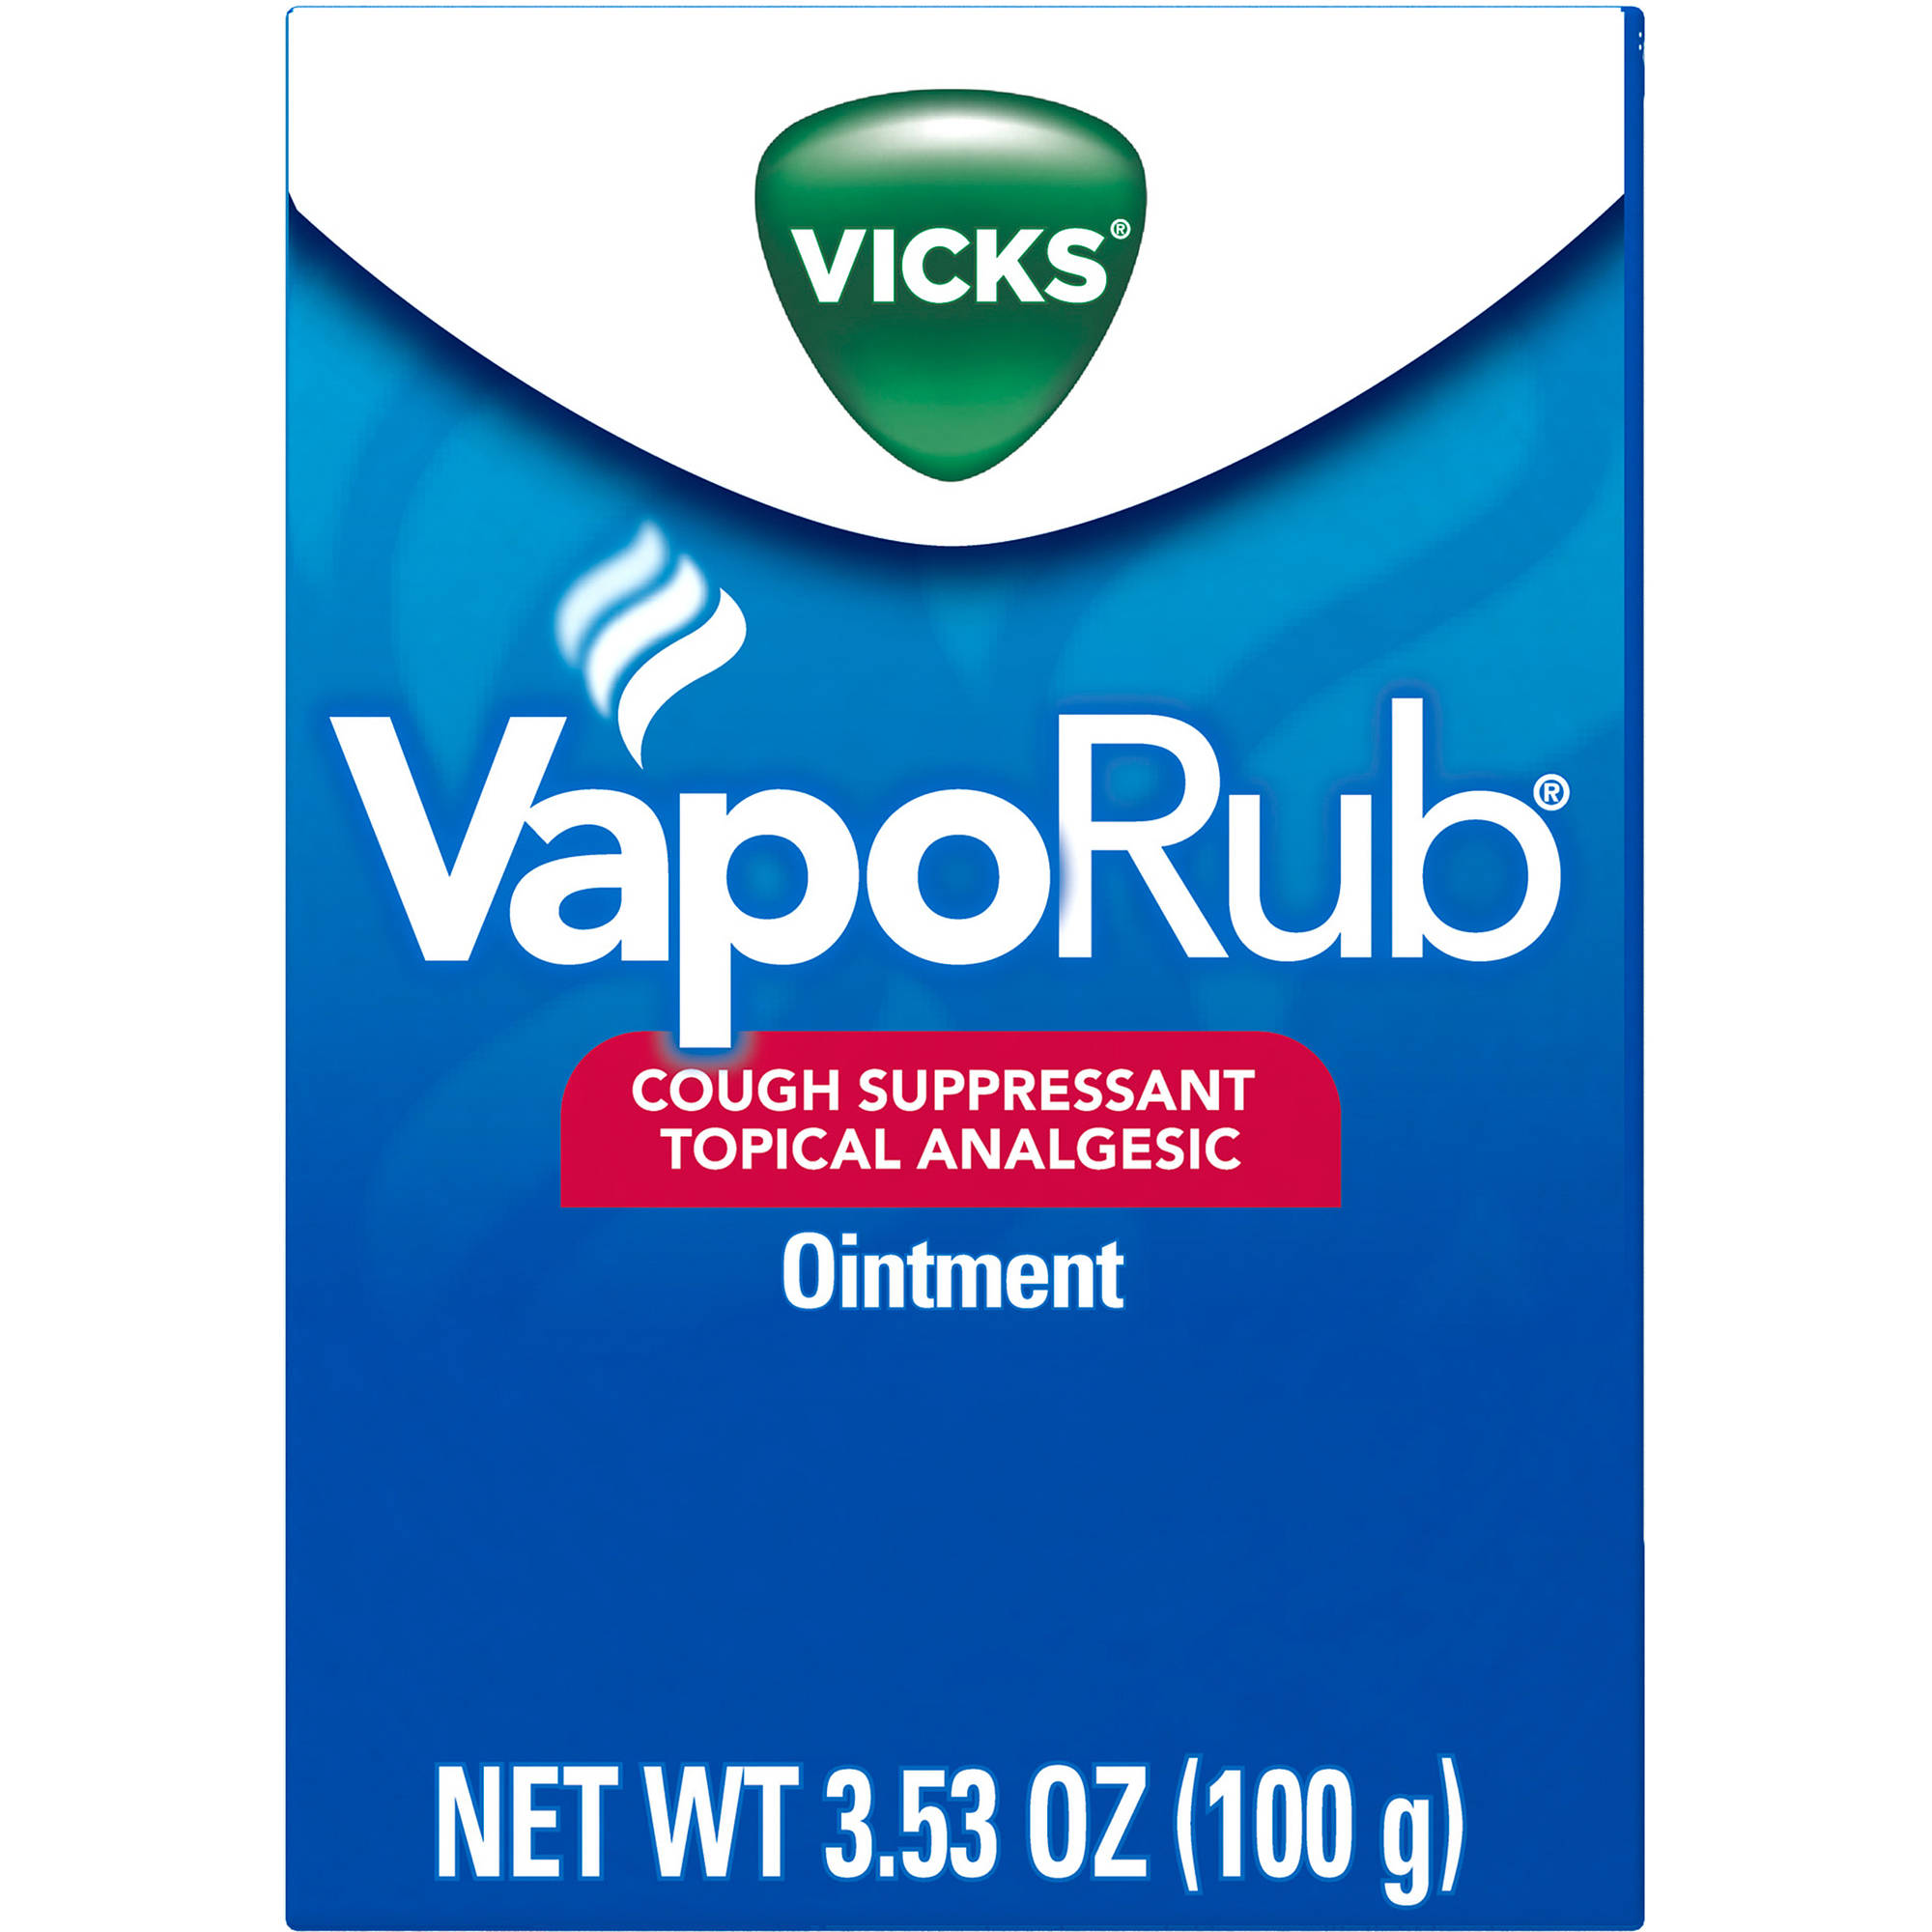 Vicks VapoRub Cough Suppressant Topical Analgesic Ointment, 3.53 oz